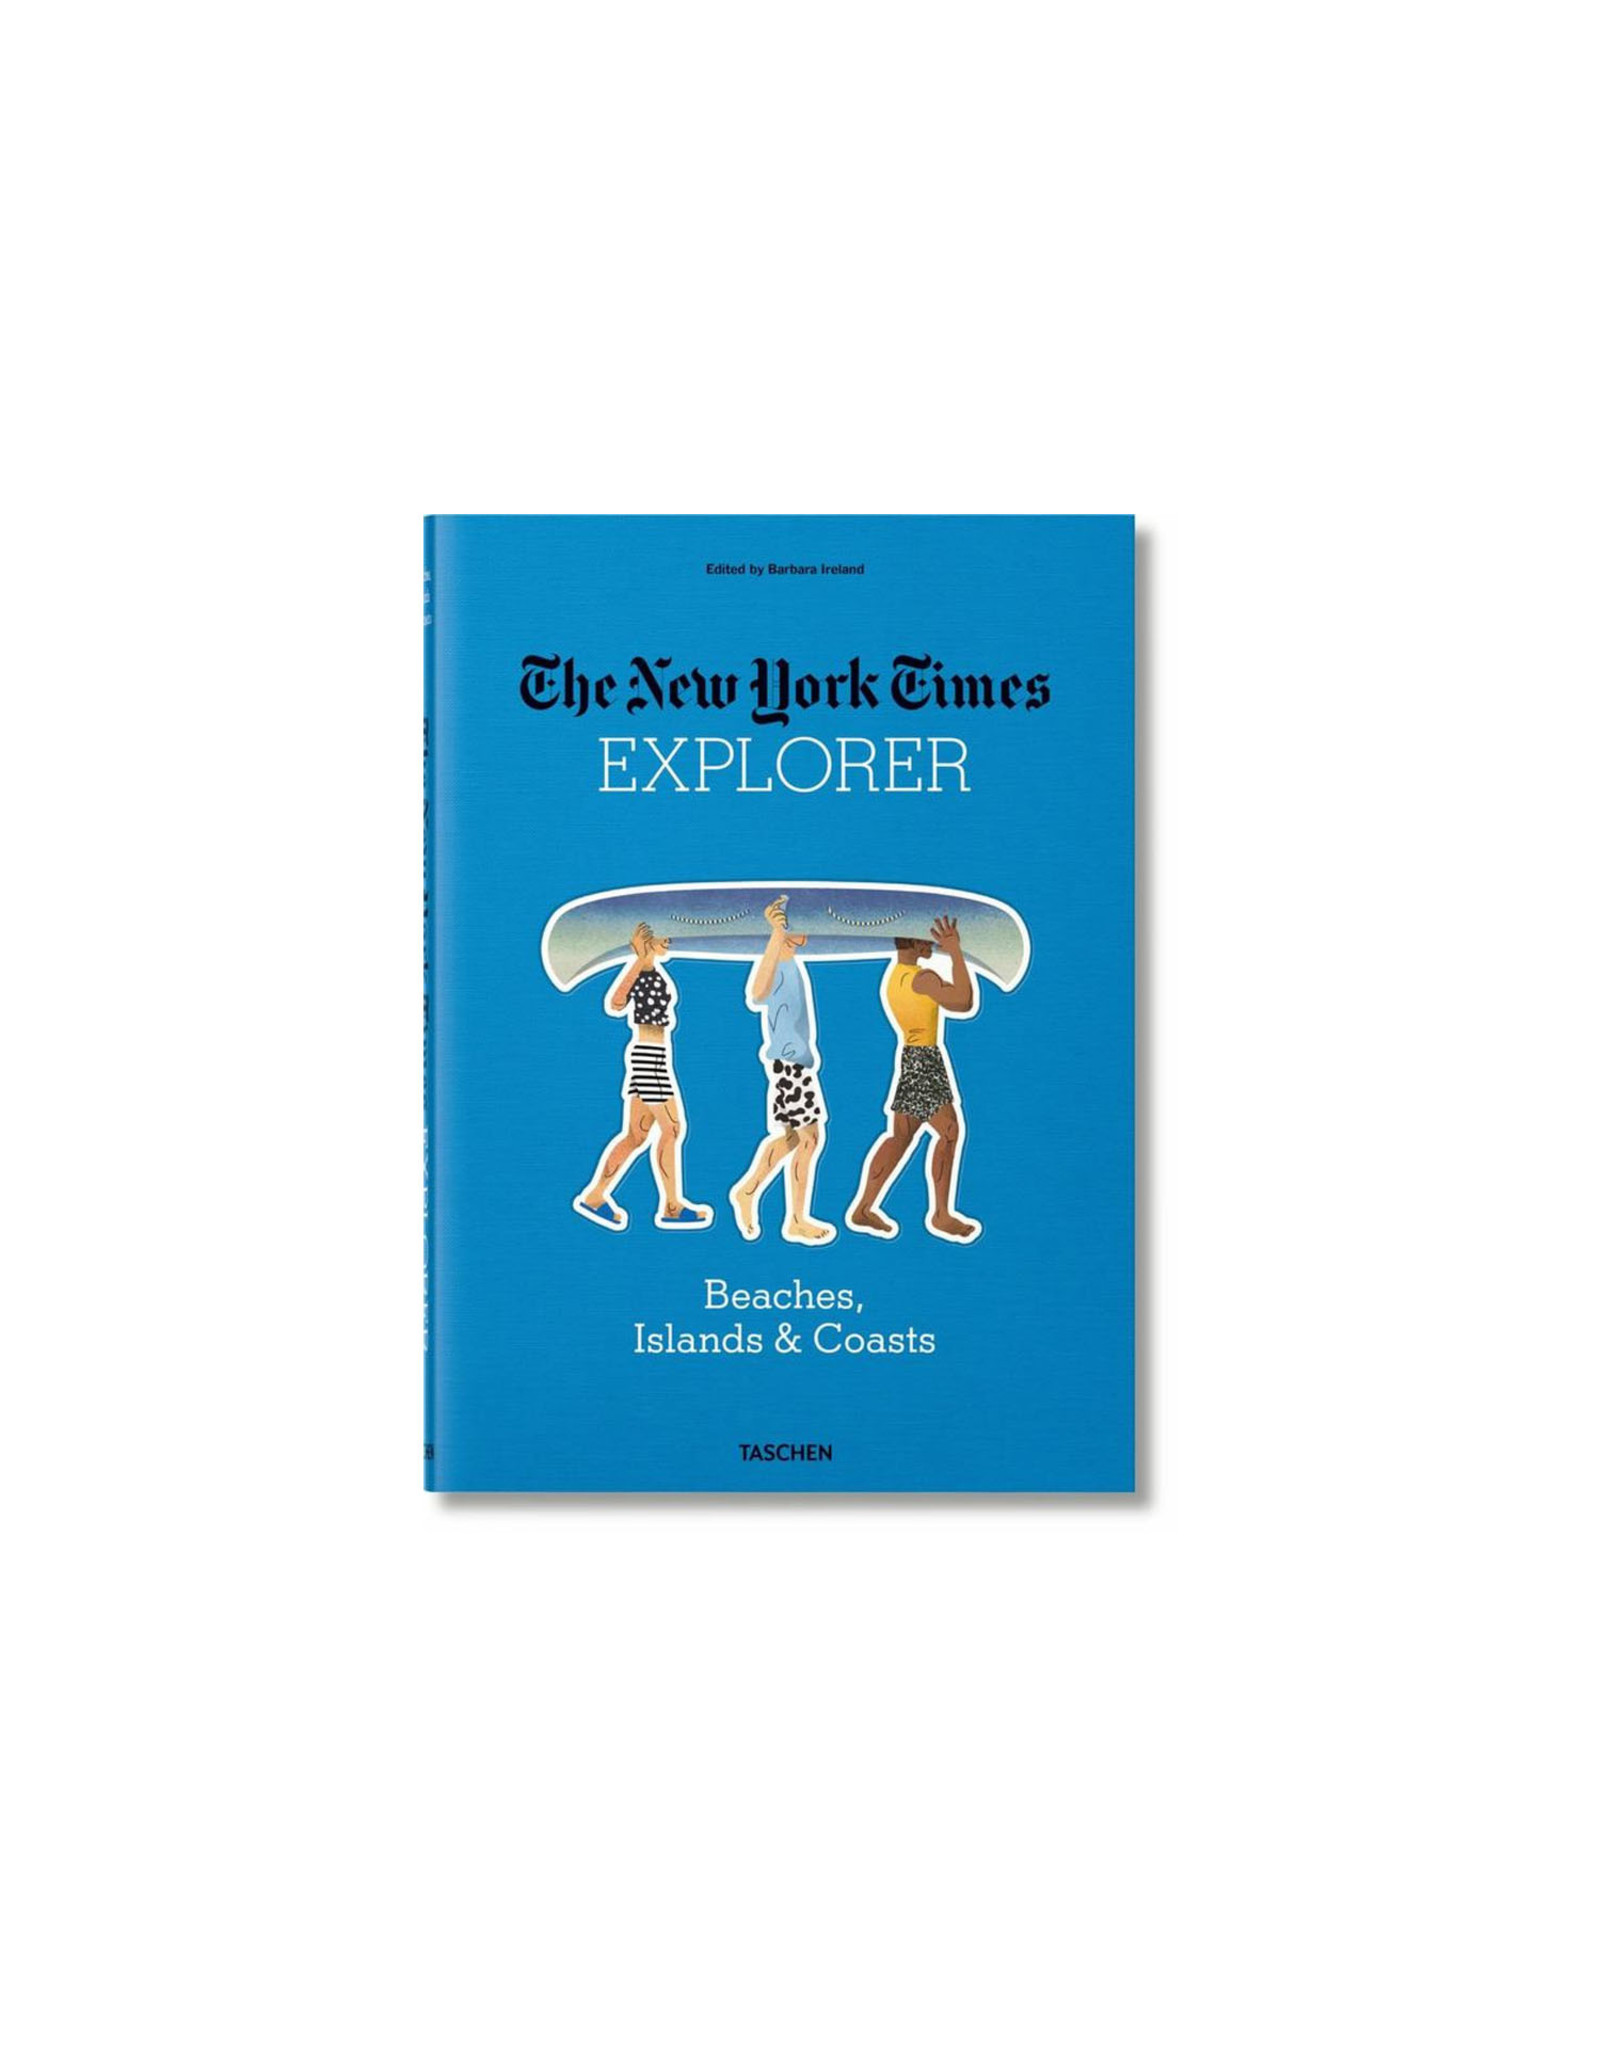 New York Times Explorer: Beaches, Islands, & Coasts